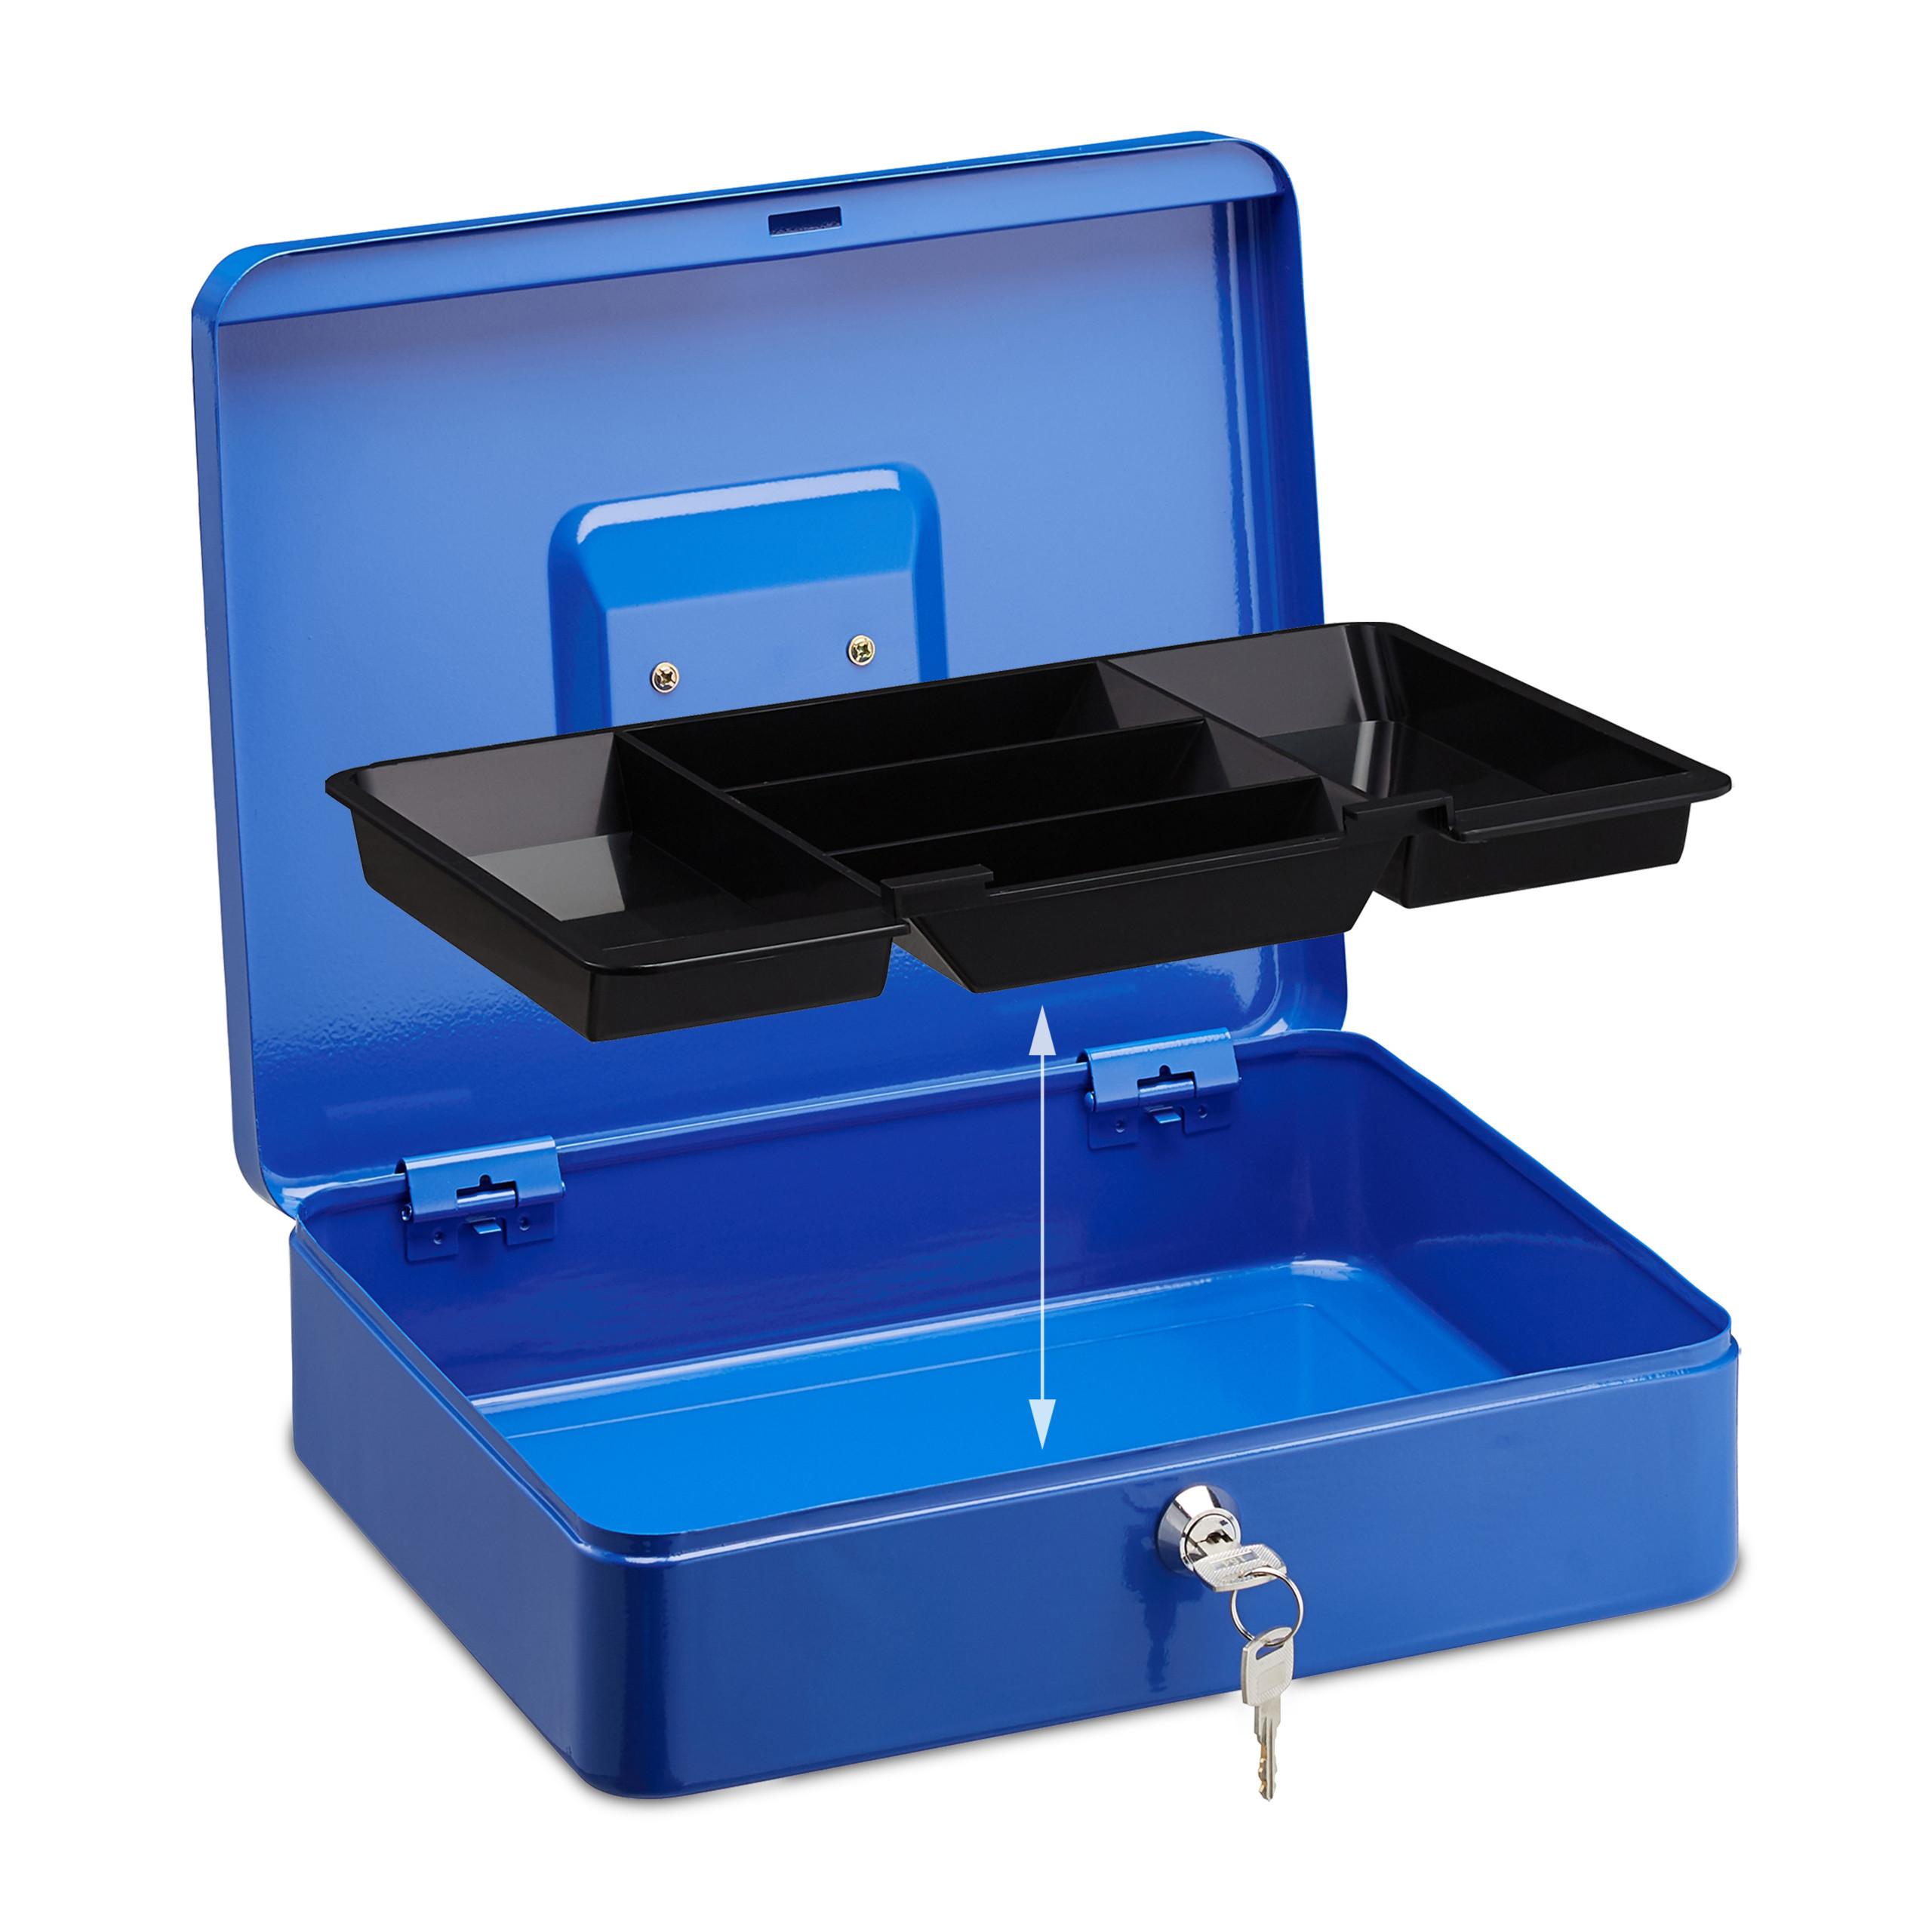 Lockable-Cash-Box-Large-Locking-Money-Box-with-2-Keys-Metal-Case-Safe thumbnail 14